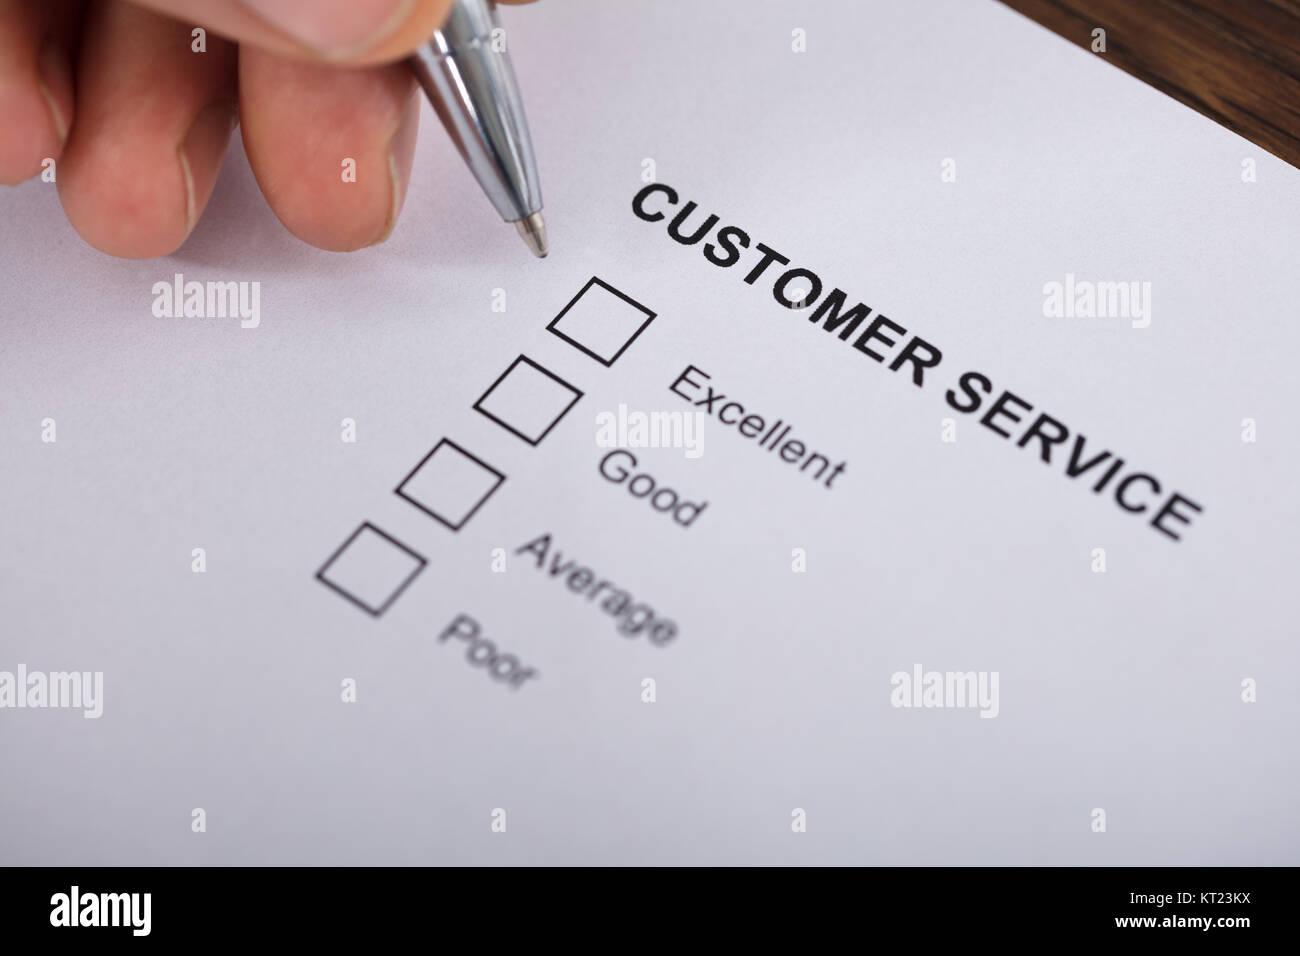 Customer Service Satisfaction Survey Form Stock Photo